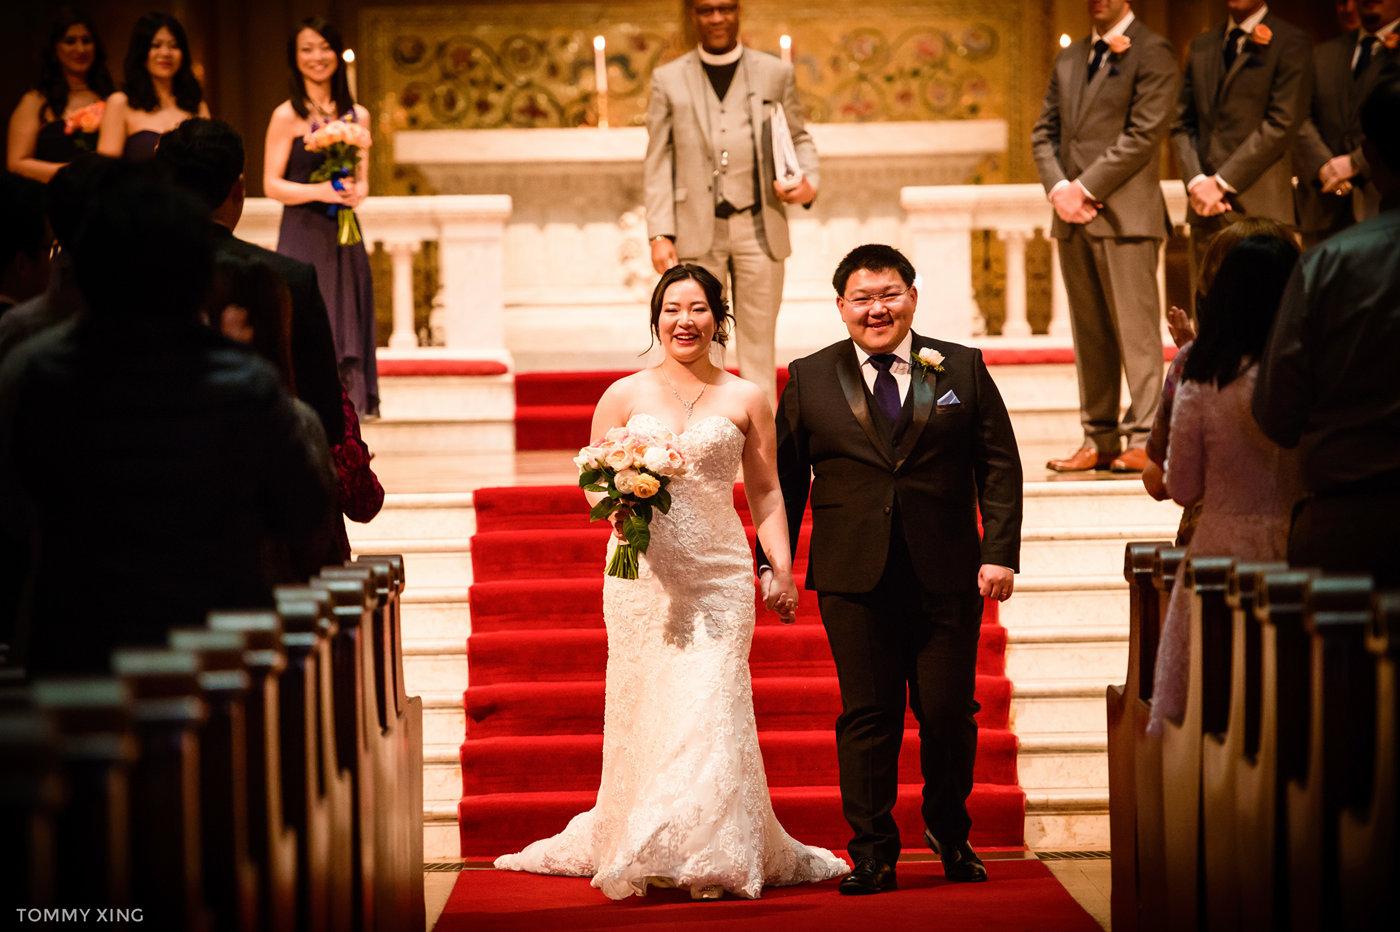 STANFORD MEMORIAL CHURCH WEDDING - Wenjie & Chengcheng - SAN FRANCISCO BAY AREA 斯坦福教堂婚礼跟拍 - 洛杉矶婚礼婚纱照摄影师 Tommy Xing Photography120.jpg